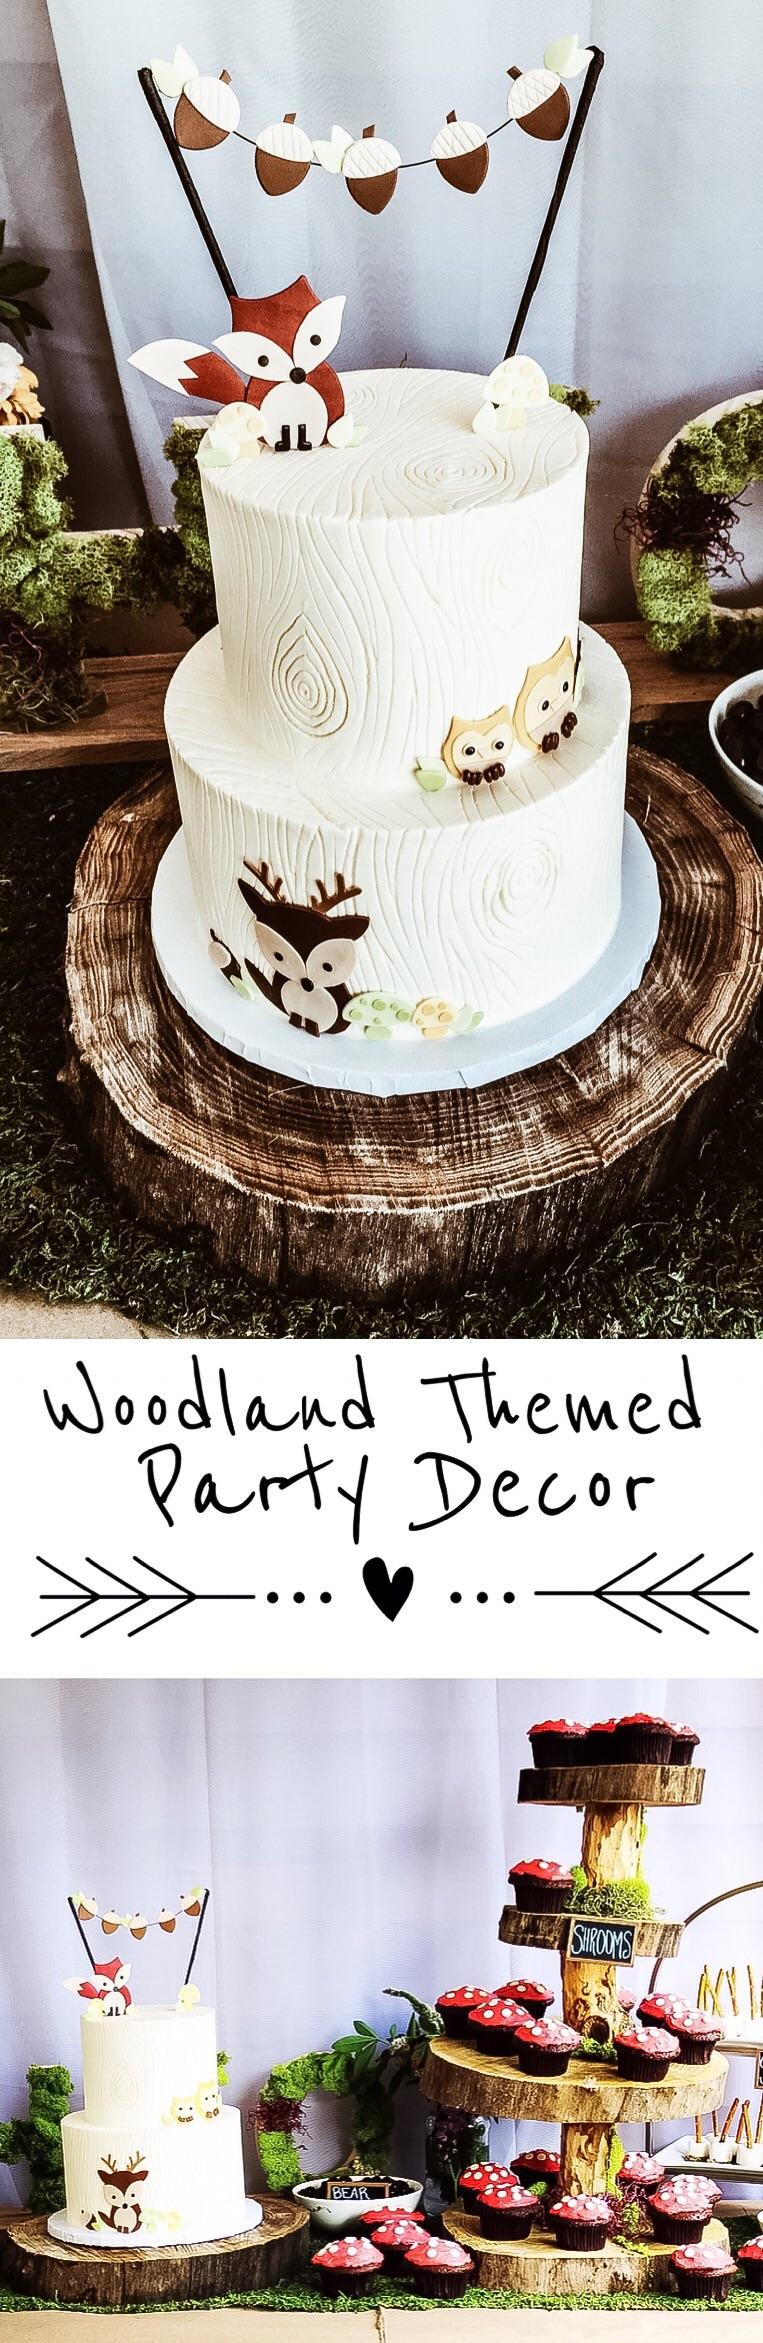 Woodland animal themed party decor.